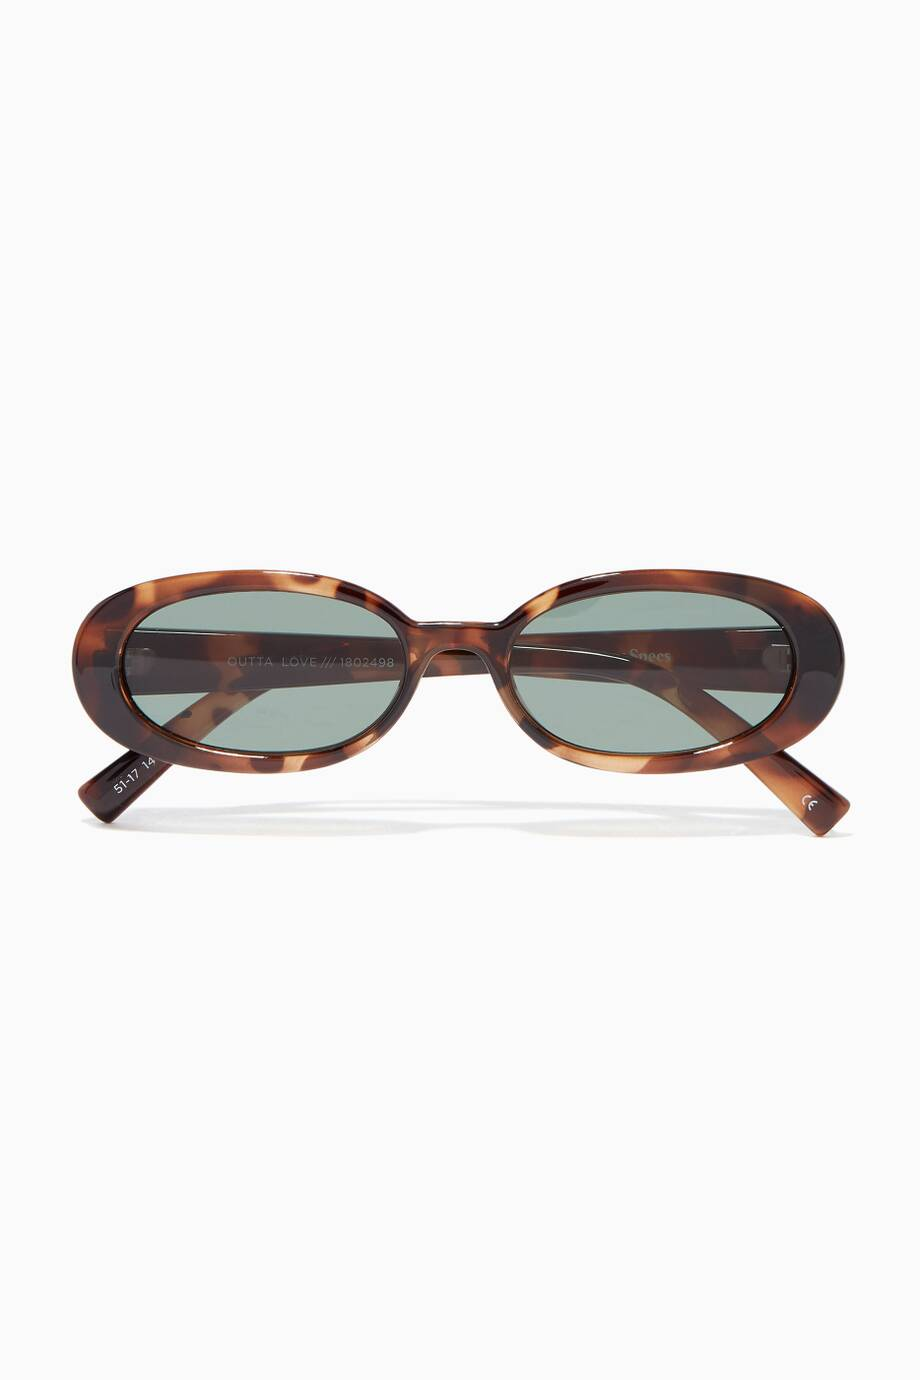 606ef92ac1 Shop Luxury Le Specs Tort Acetate Outta Love Sunglasses